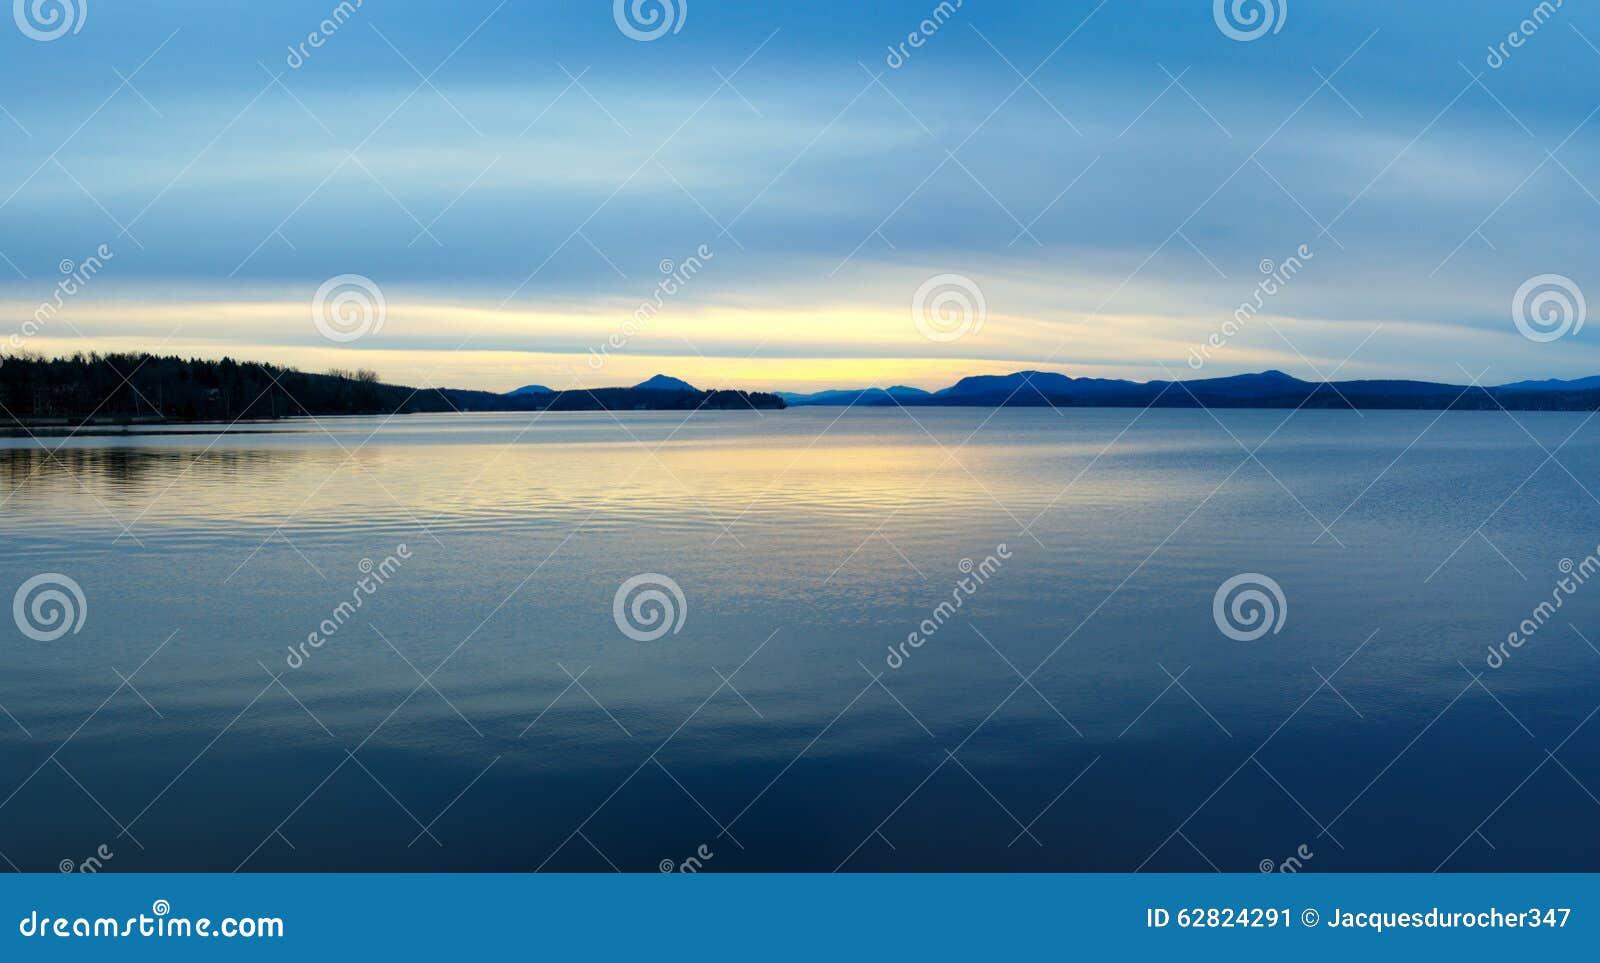 sky blue mountain reflection - photo #45